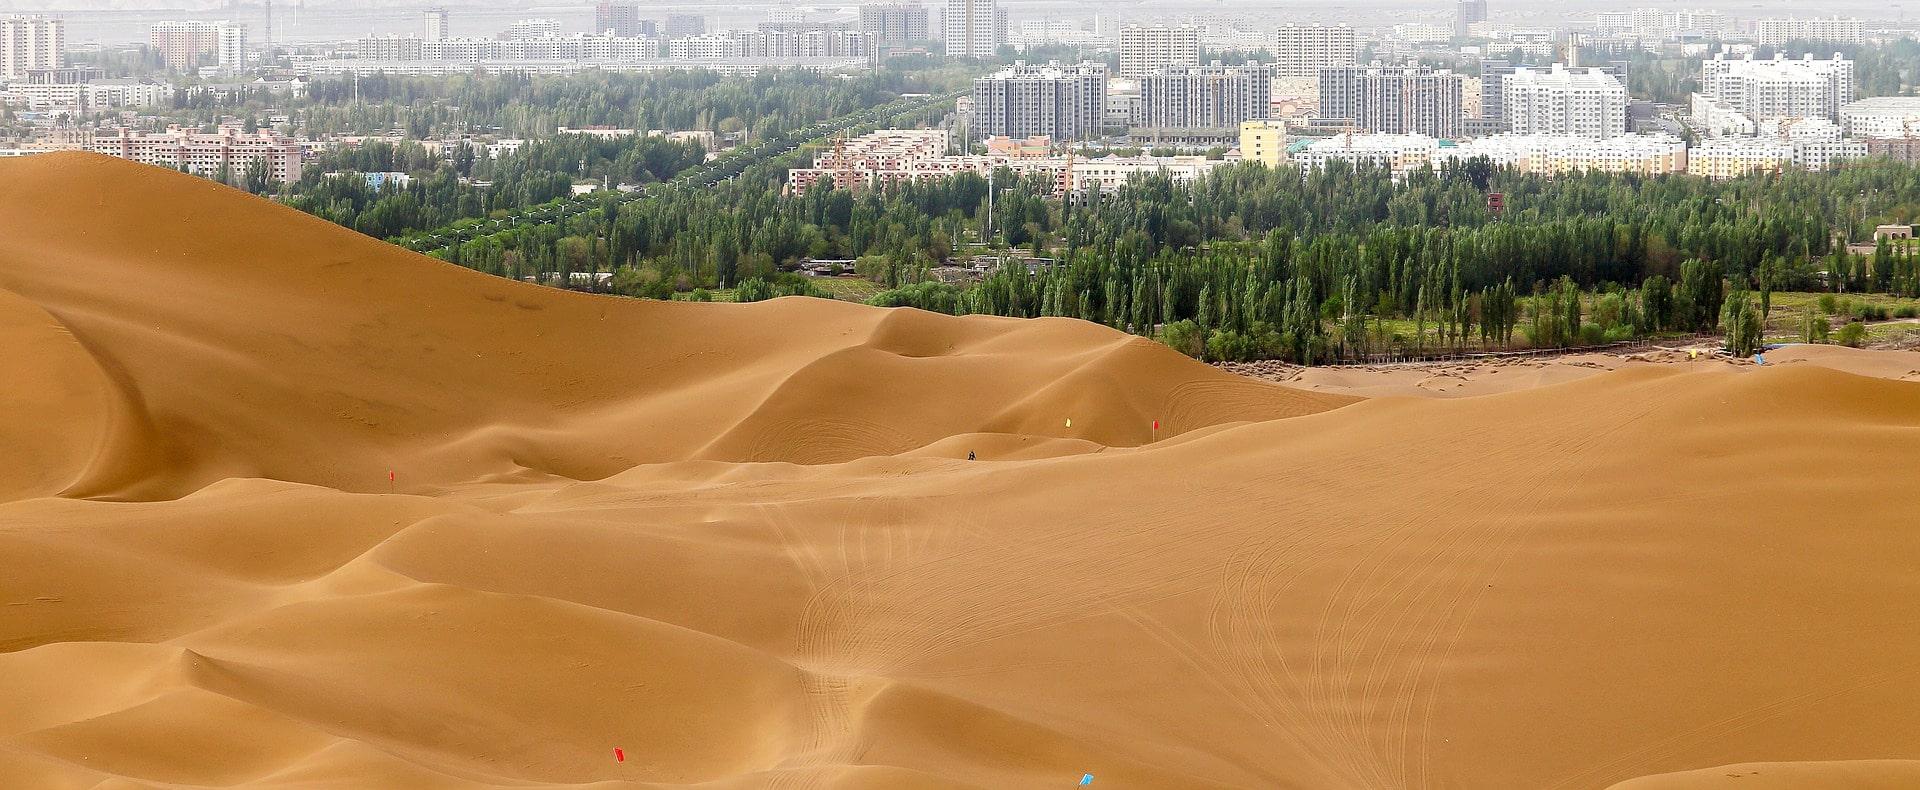 Turpan, China